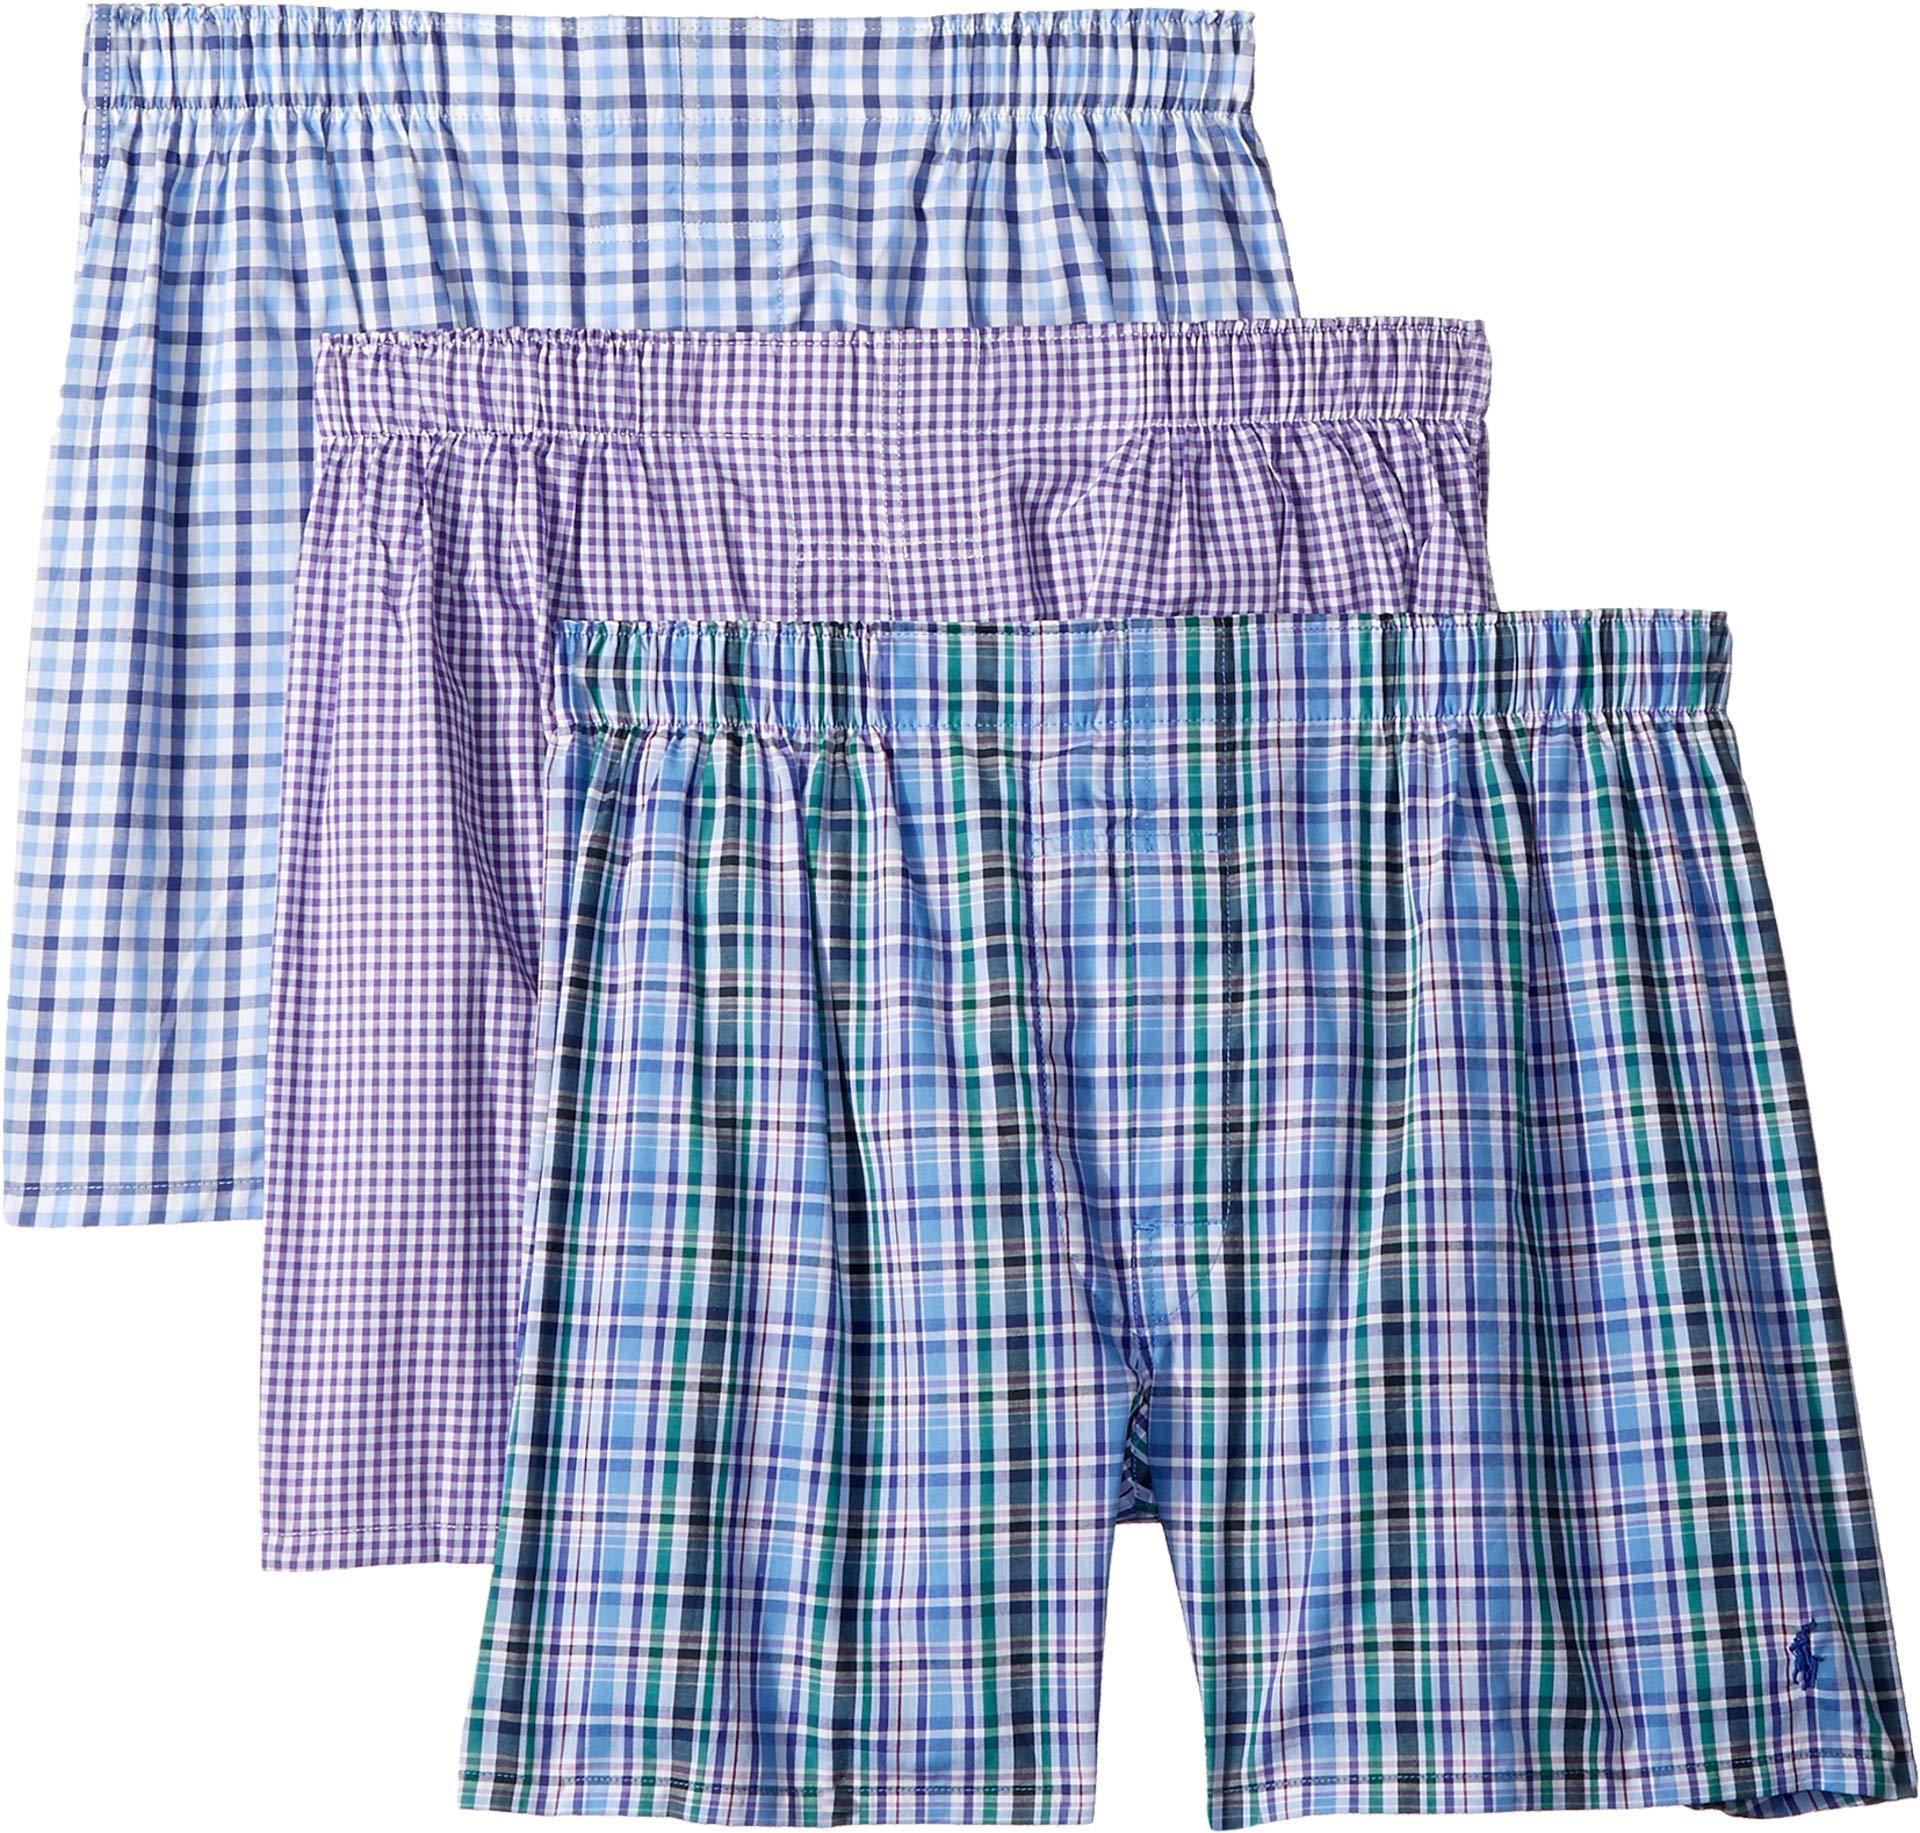 Polo Ralph Lauren Classic Fit Woven Boxers 3-Pack, M, Percy Plaid Purple